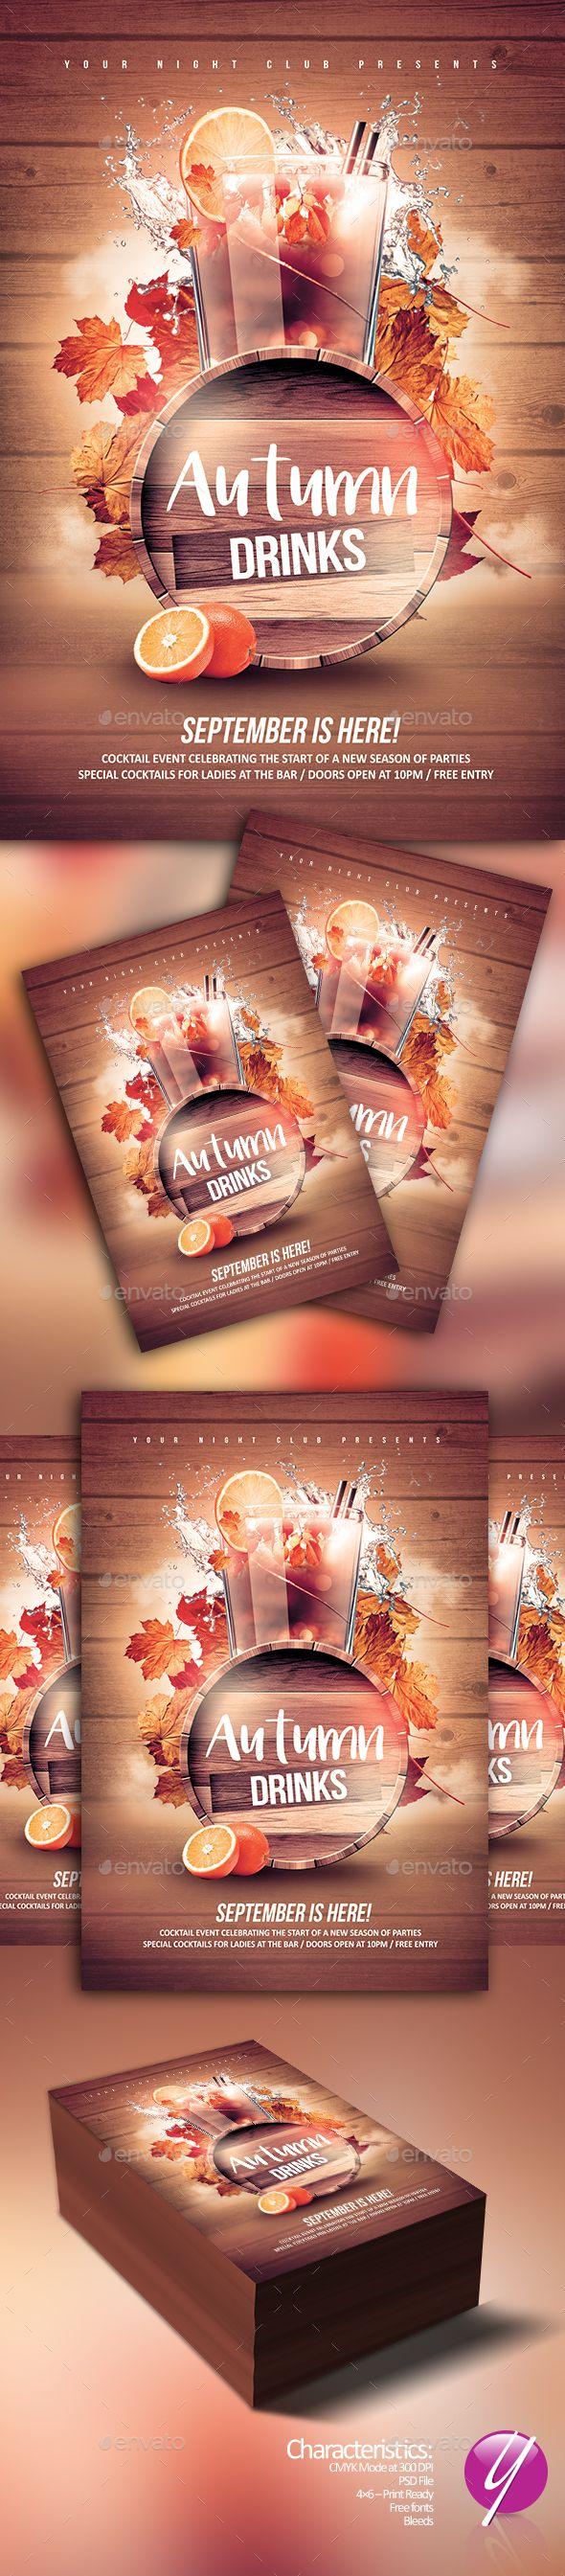 Autumn Drinks Flyer Template PSD. Download here: https://graphicriver.net/item/autumn-drinks/17501822?ref=ksioks